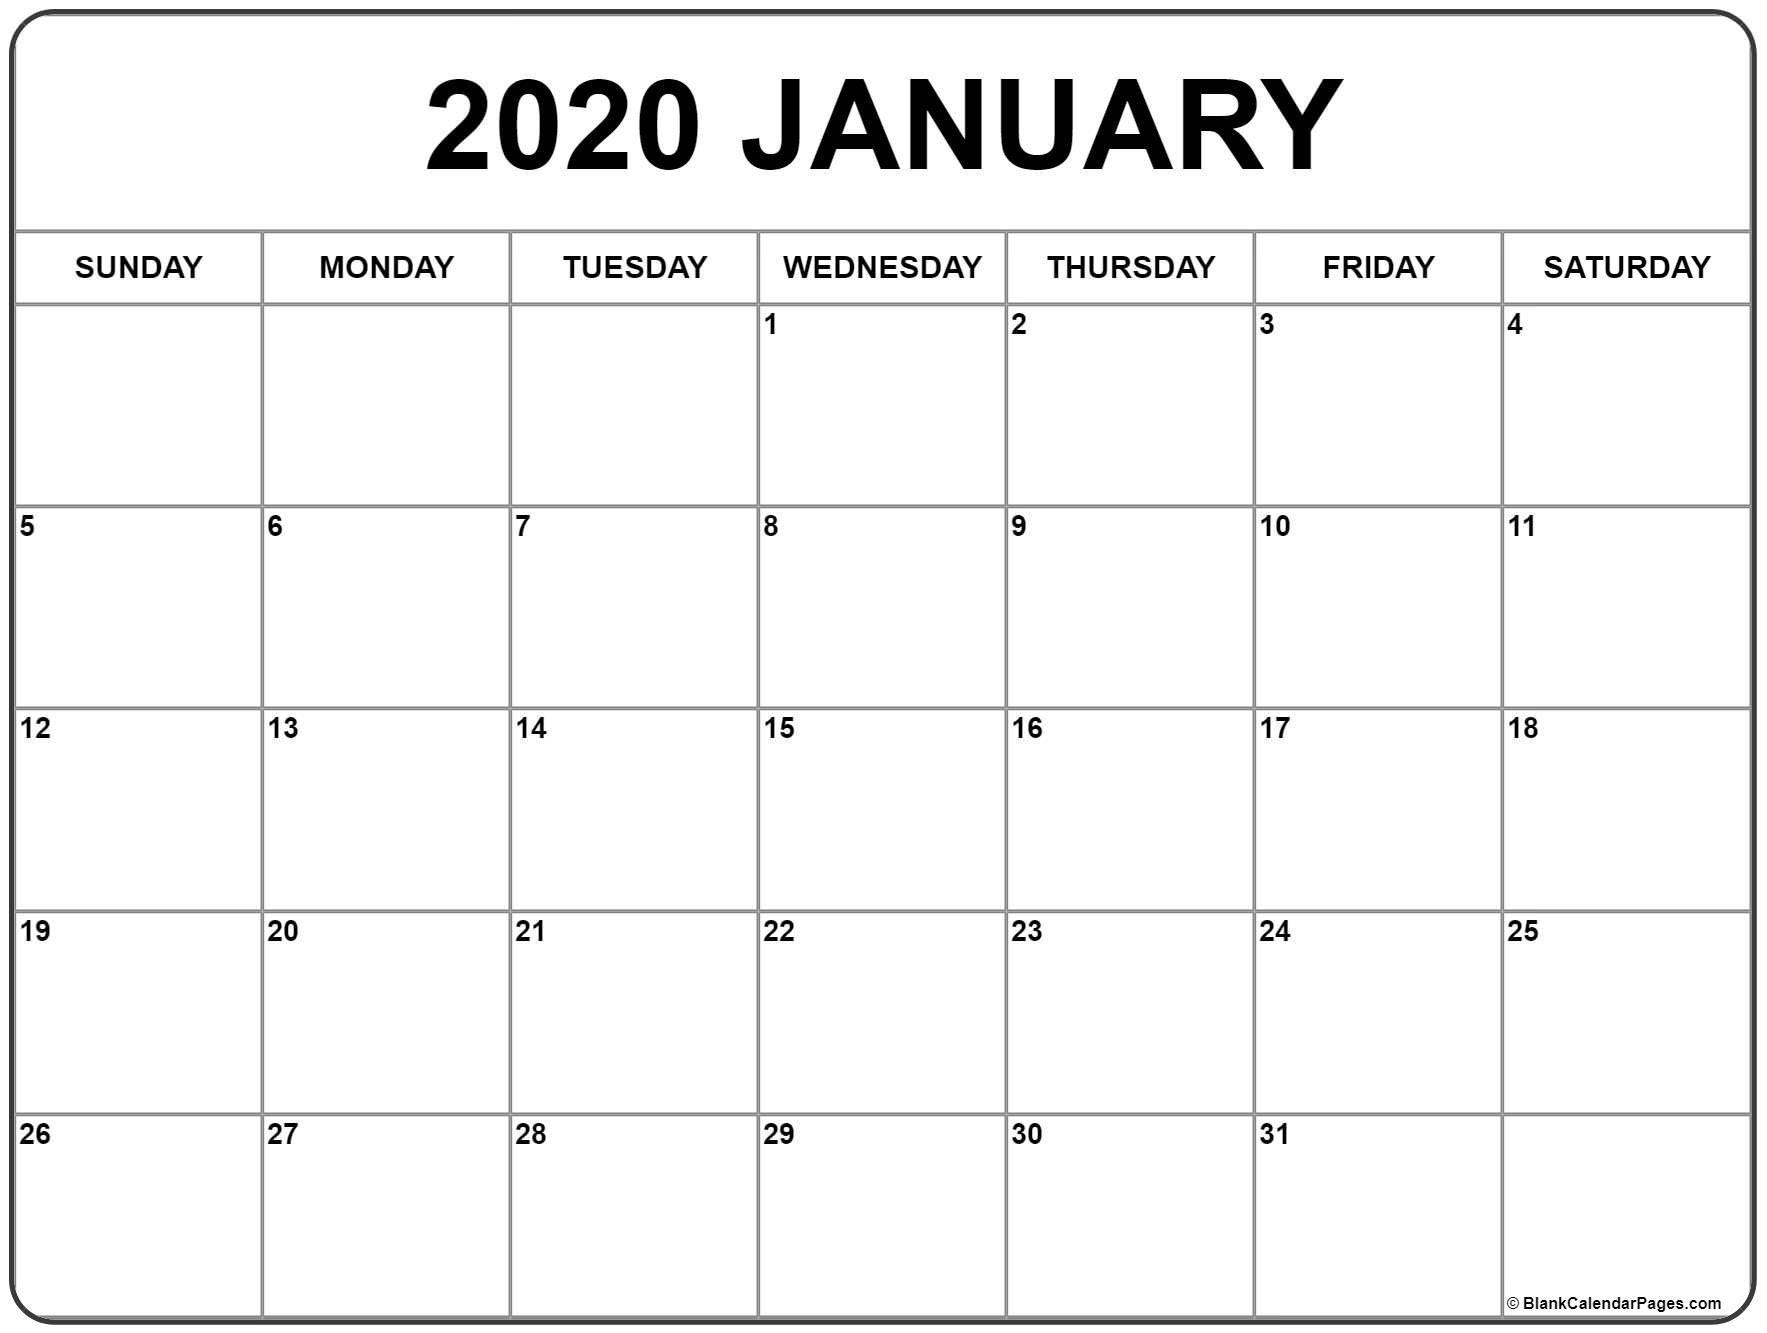 January 2020 Calendar | Free Printable Monthly Calendars intended for Free Printable 2020 Calendars Large Numbers